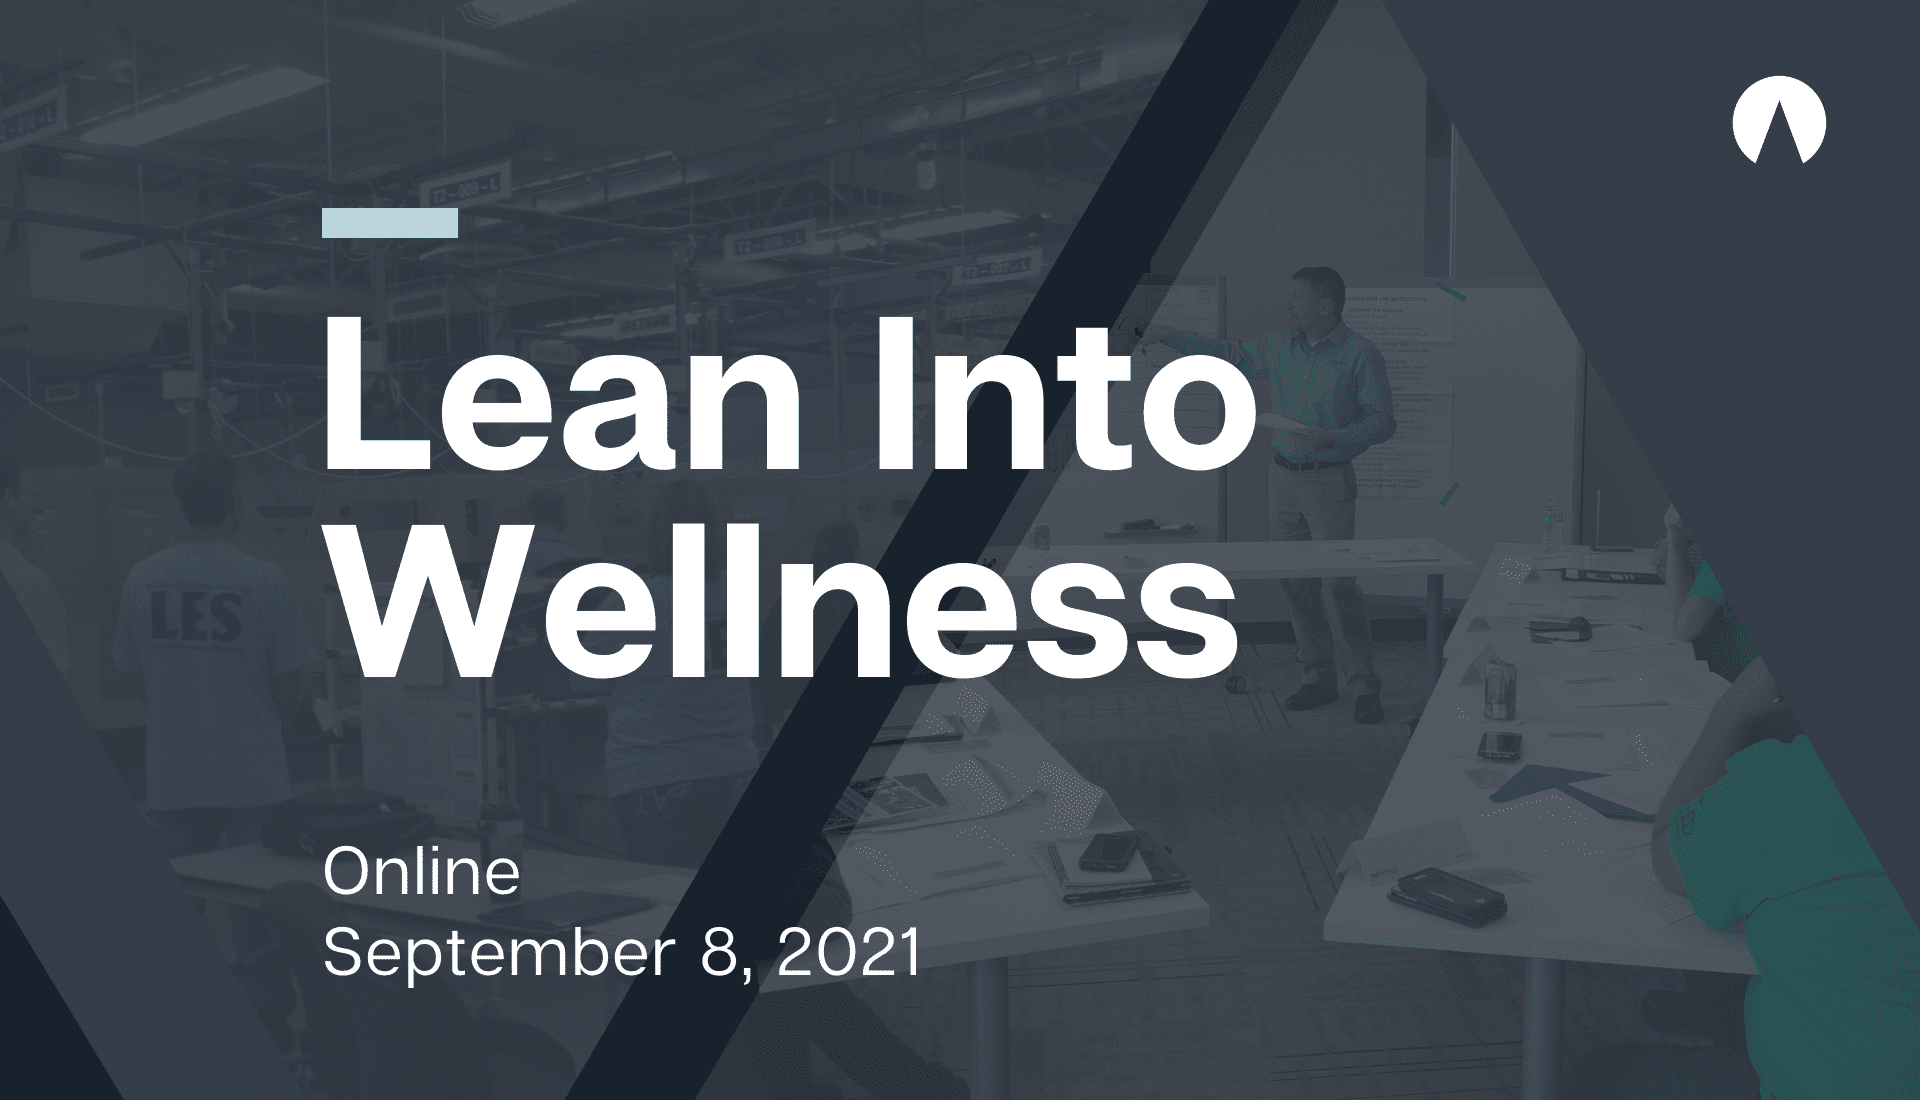 Lean Into Wellness